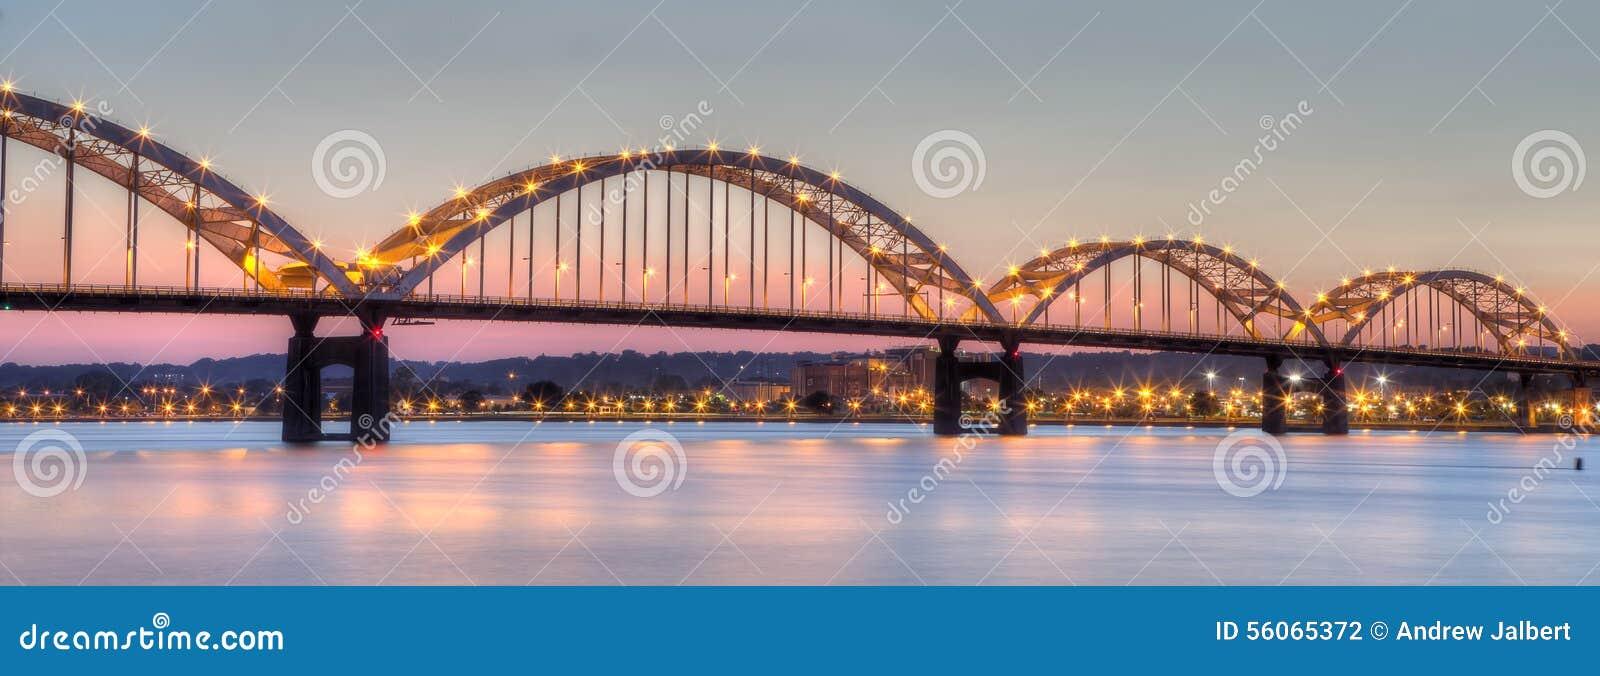 Centennial Bridge Connecting Moline, Illinois To Davenport ...